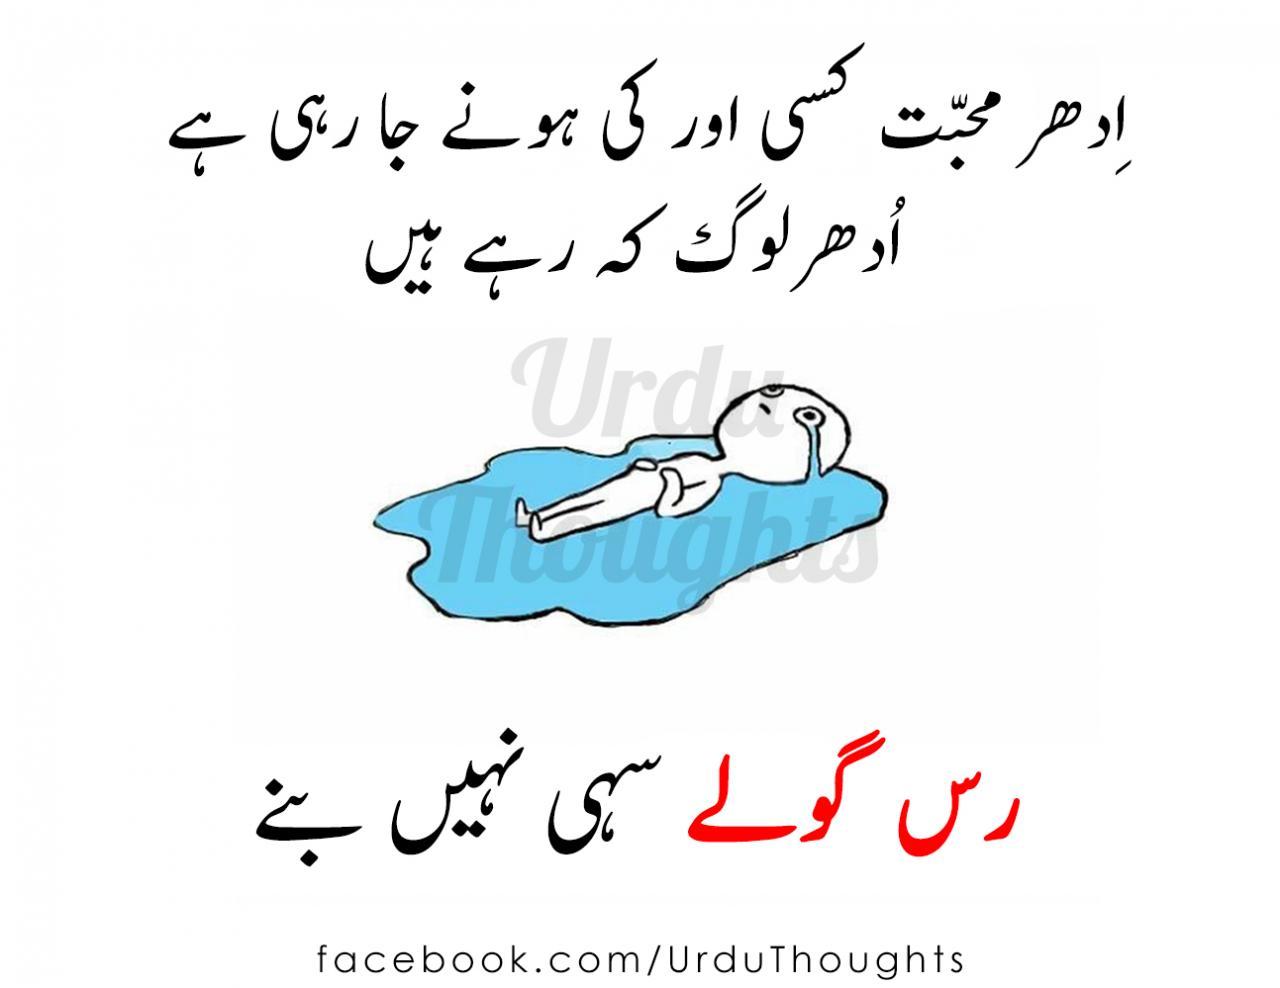 Funny Images Photos Urdu Jokes Images